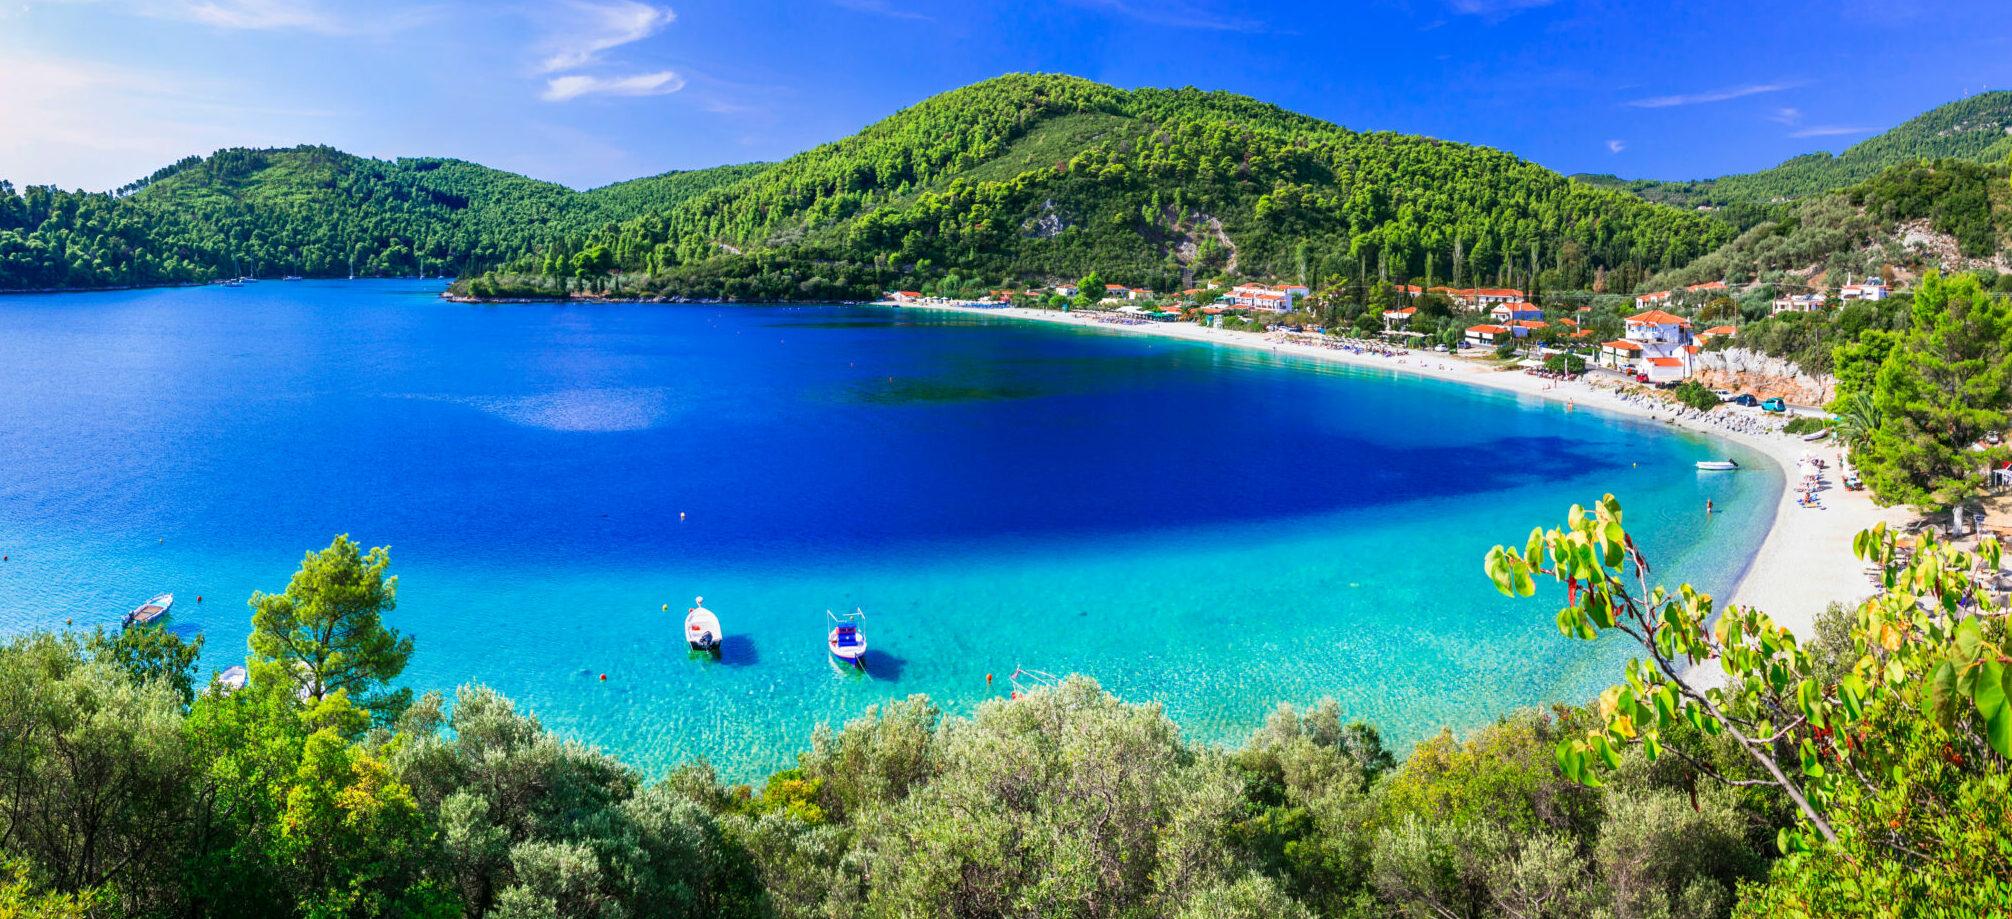 Three days on Skopelos, the greenest Aegean isle